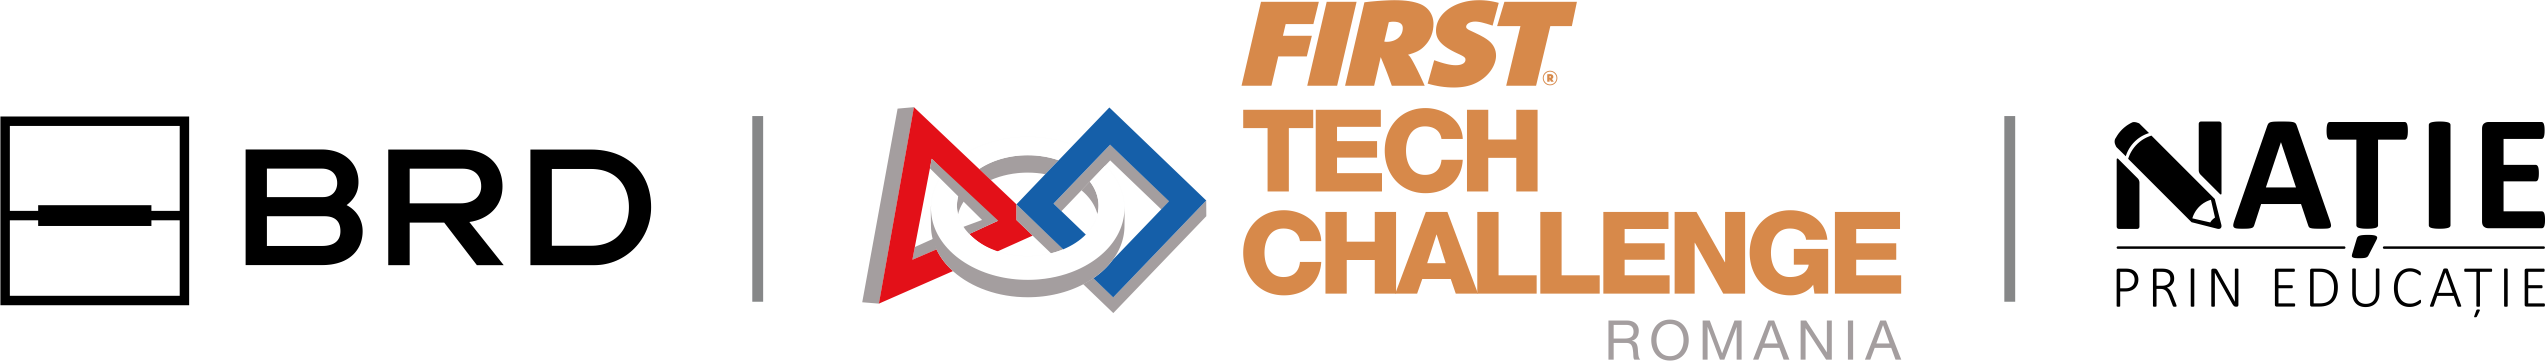 Logo_Program_robotica_-_BRD_FIRST_Tech_Challenge_Romania_-_2_(1).png